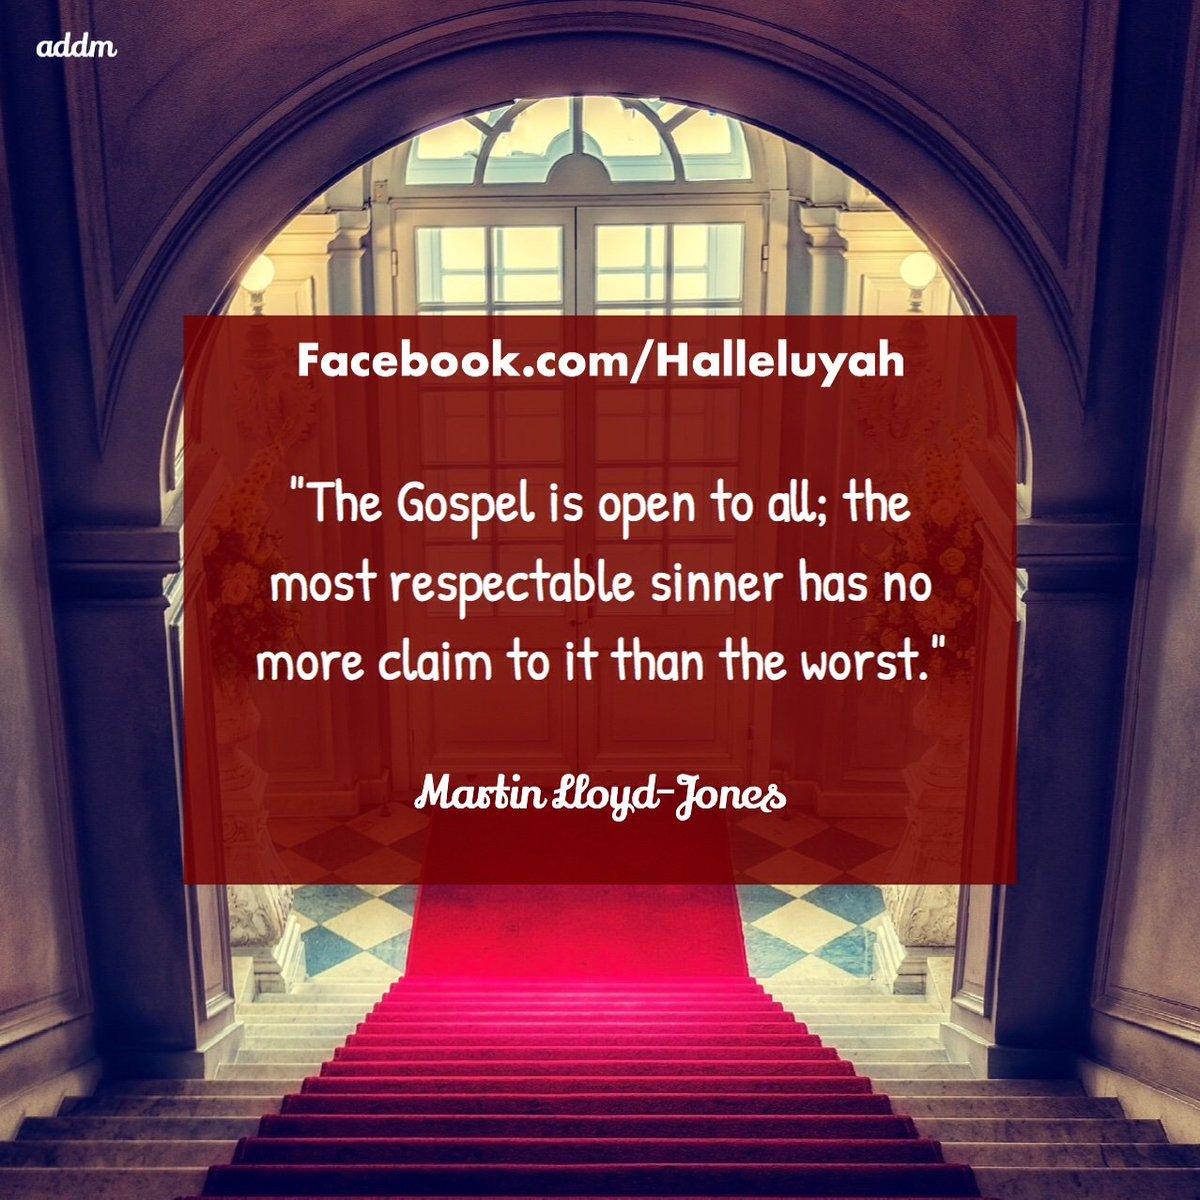 Halleluyah #MartinLloydJones #Quotes #English #Gospel